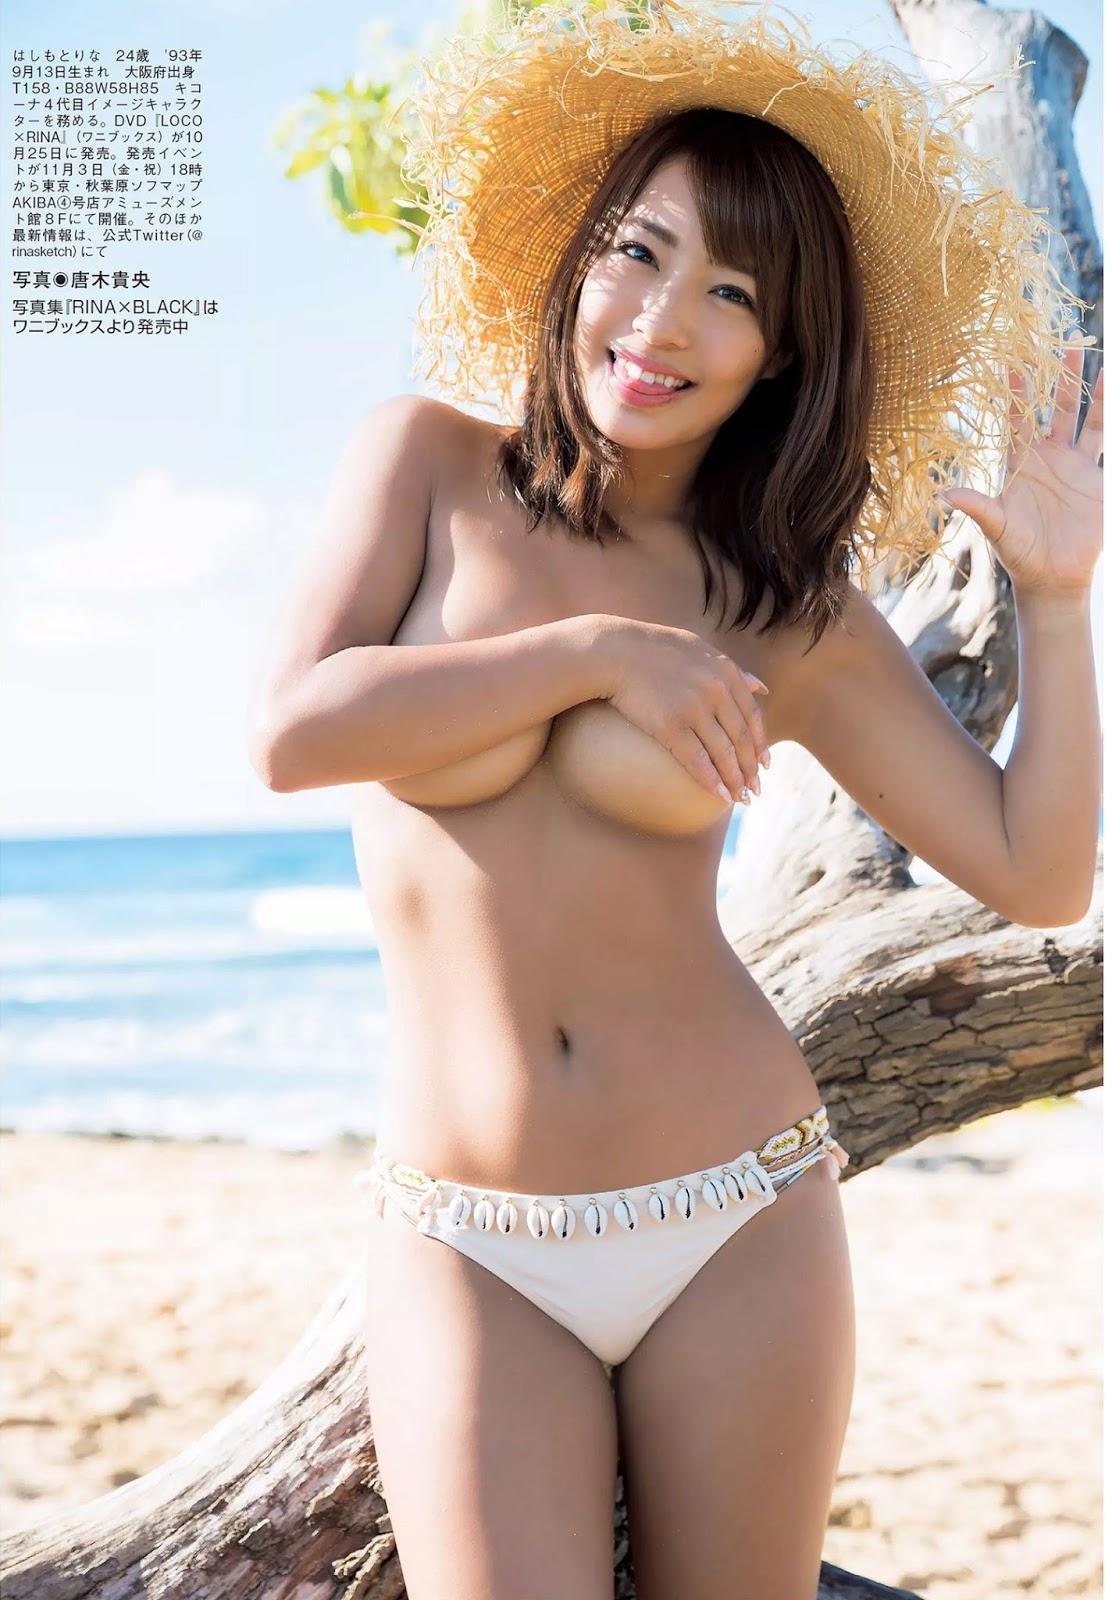 Rina Hashimoto 橋本梨菜, FLASH 電子版 2017.11.07 No.1444 (フラッシュ 2017年11月07日号)